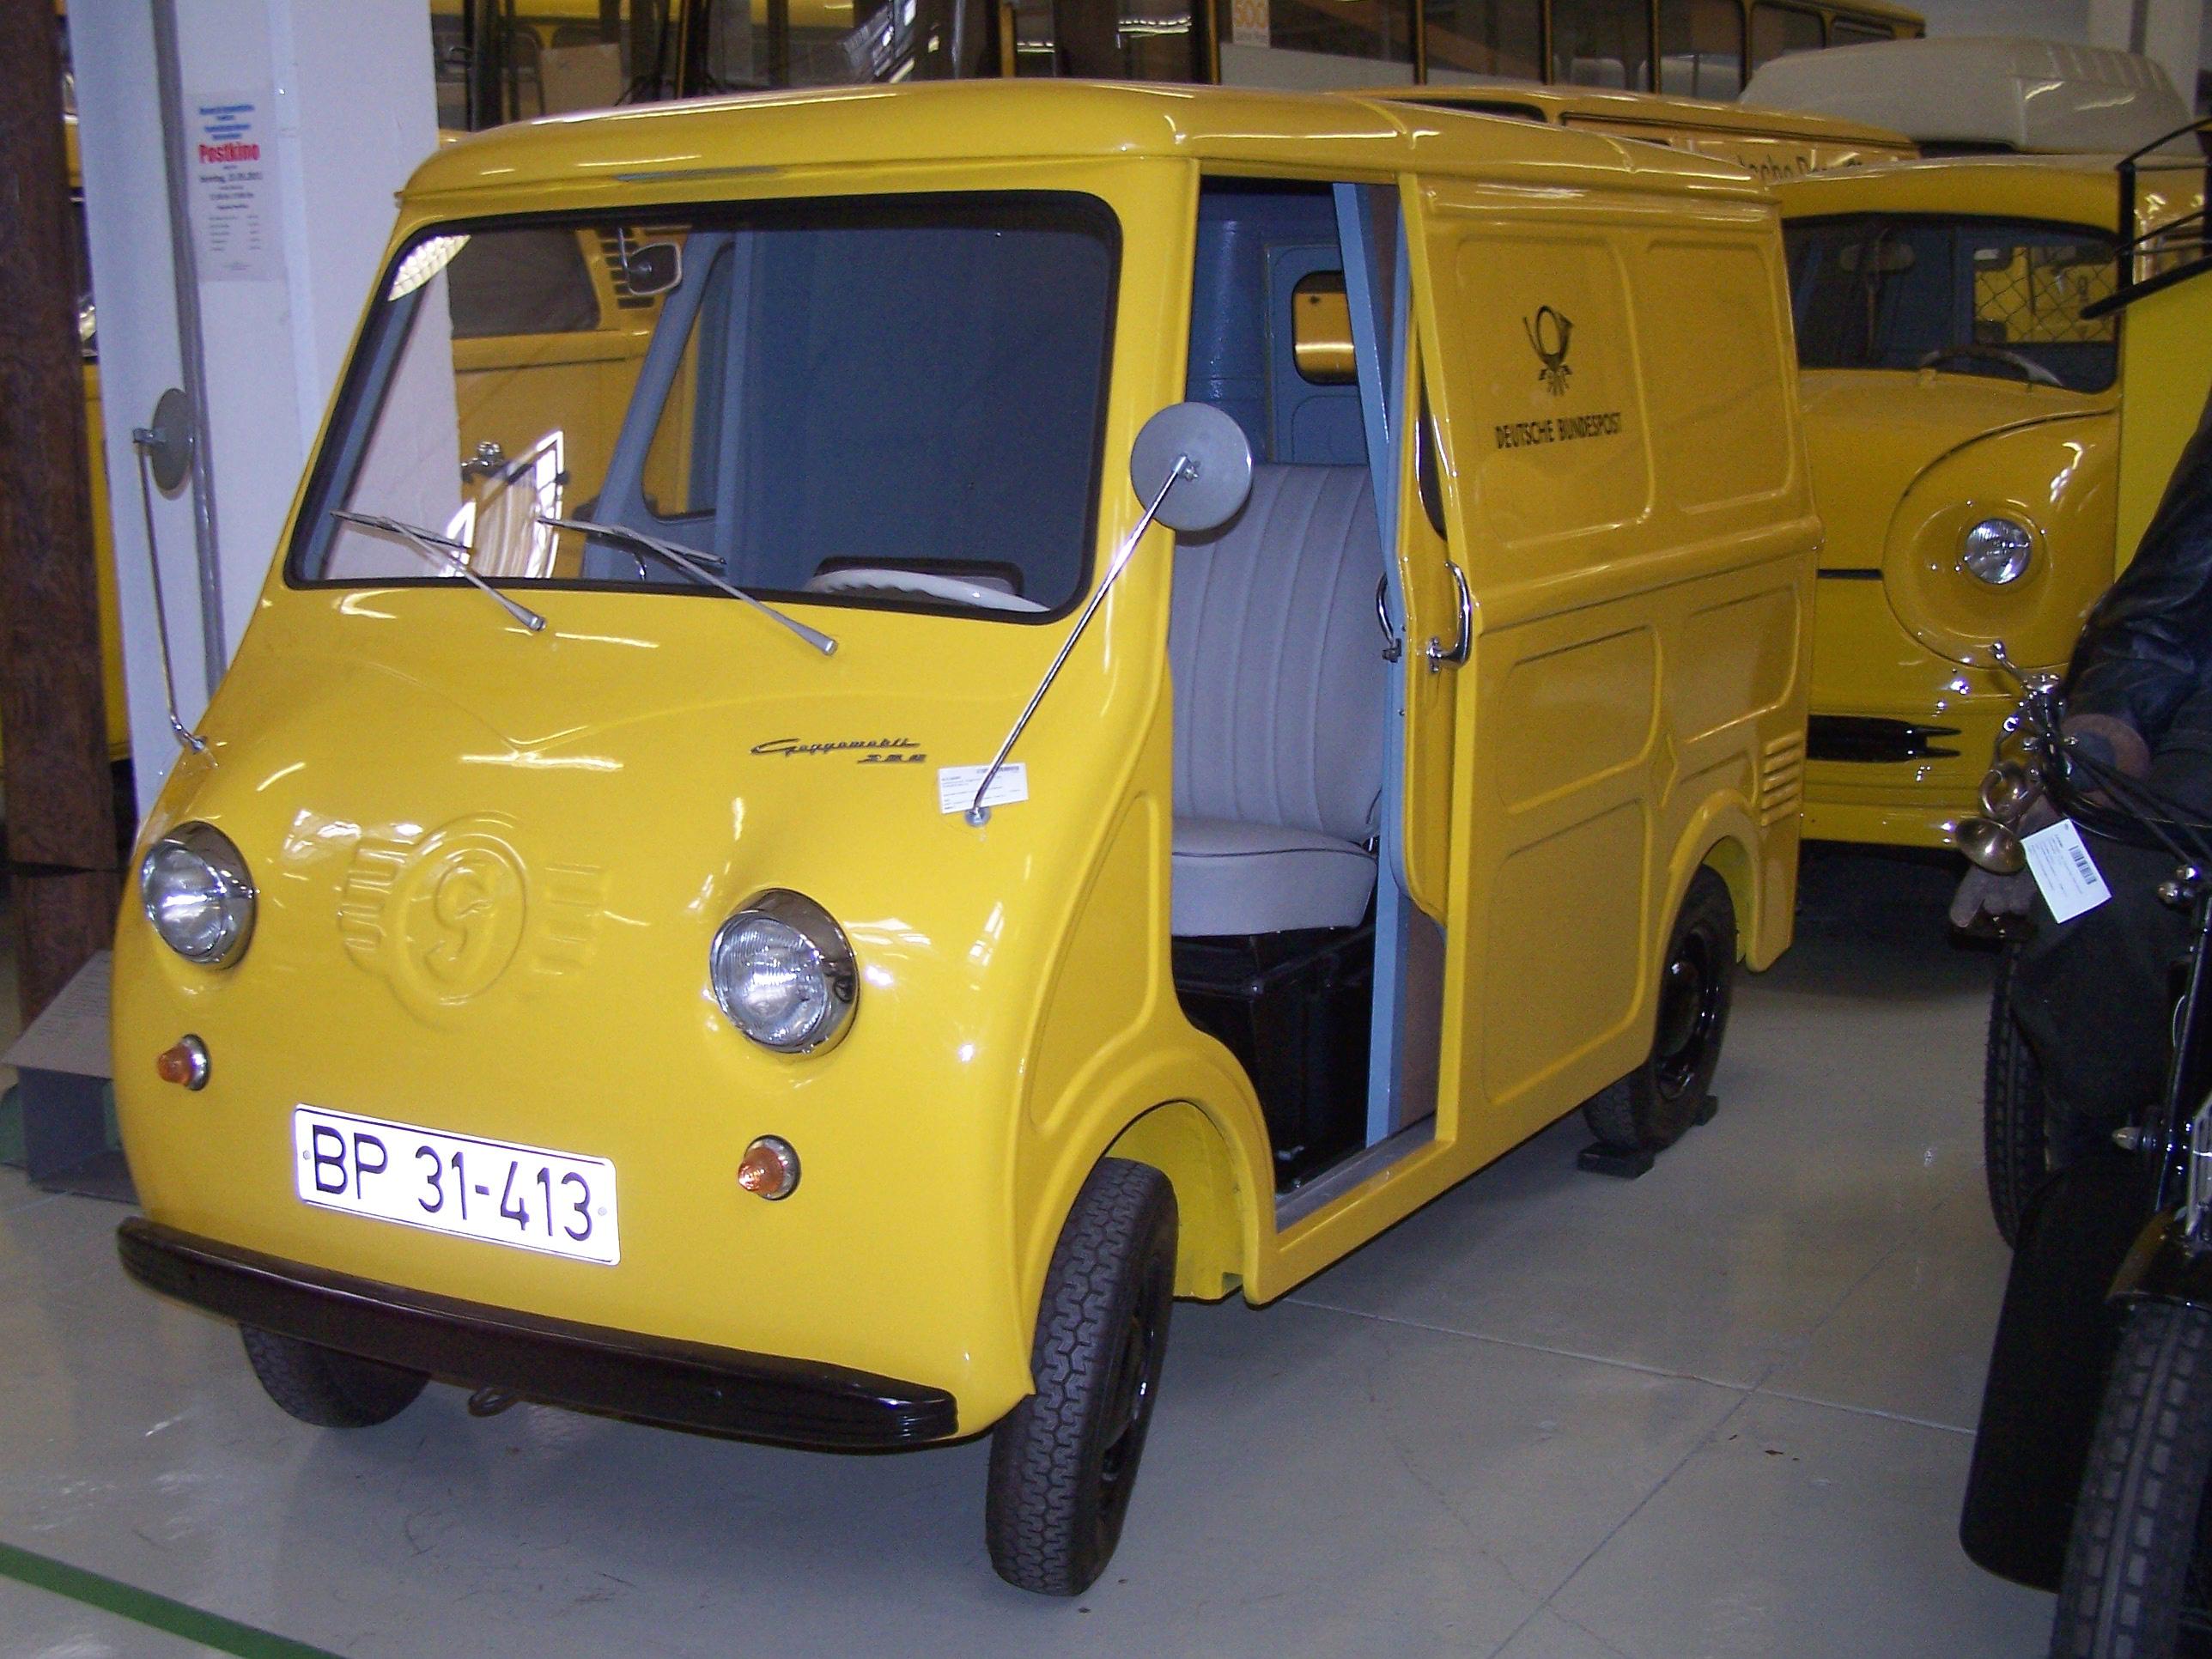 Work Van For Sale >> File:Goggomobil TL Heusenstamm 05082011.JPG - Wikimedia Commons